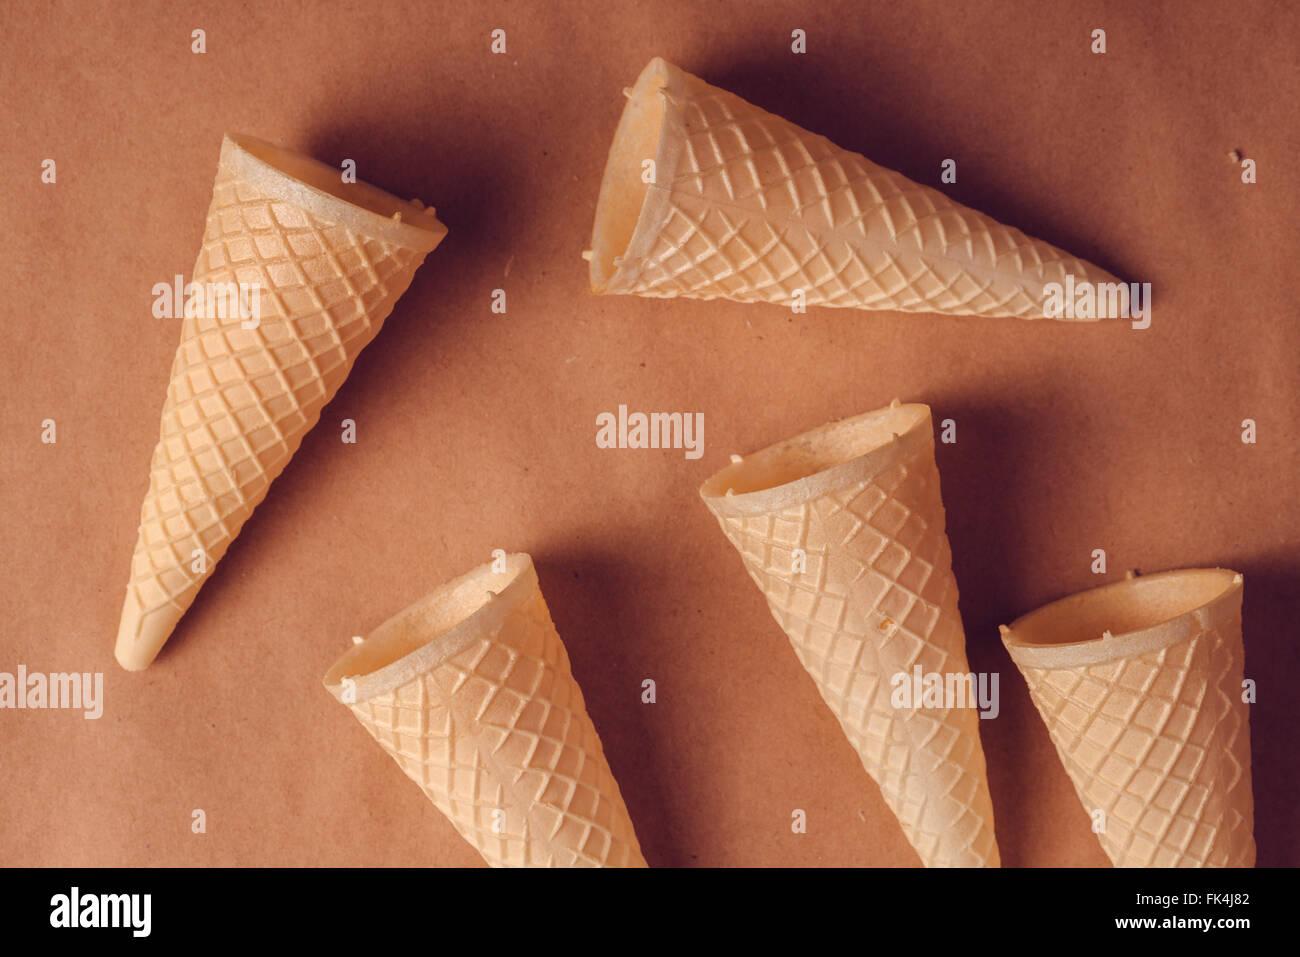 Scaterred crispy ice cream cone stack, warm retro tone, soft light, top view - Stock Image